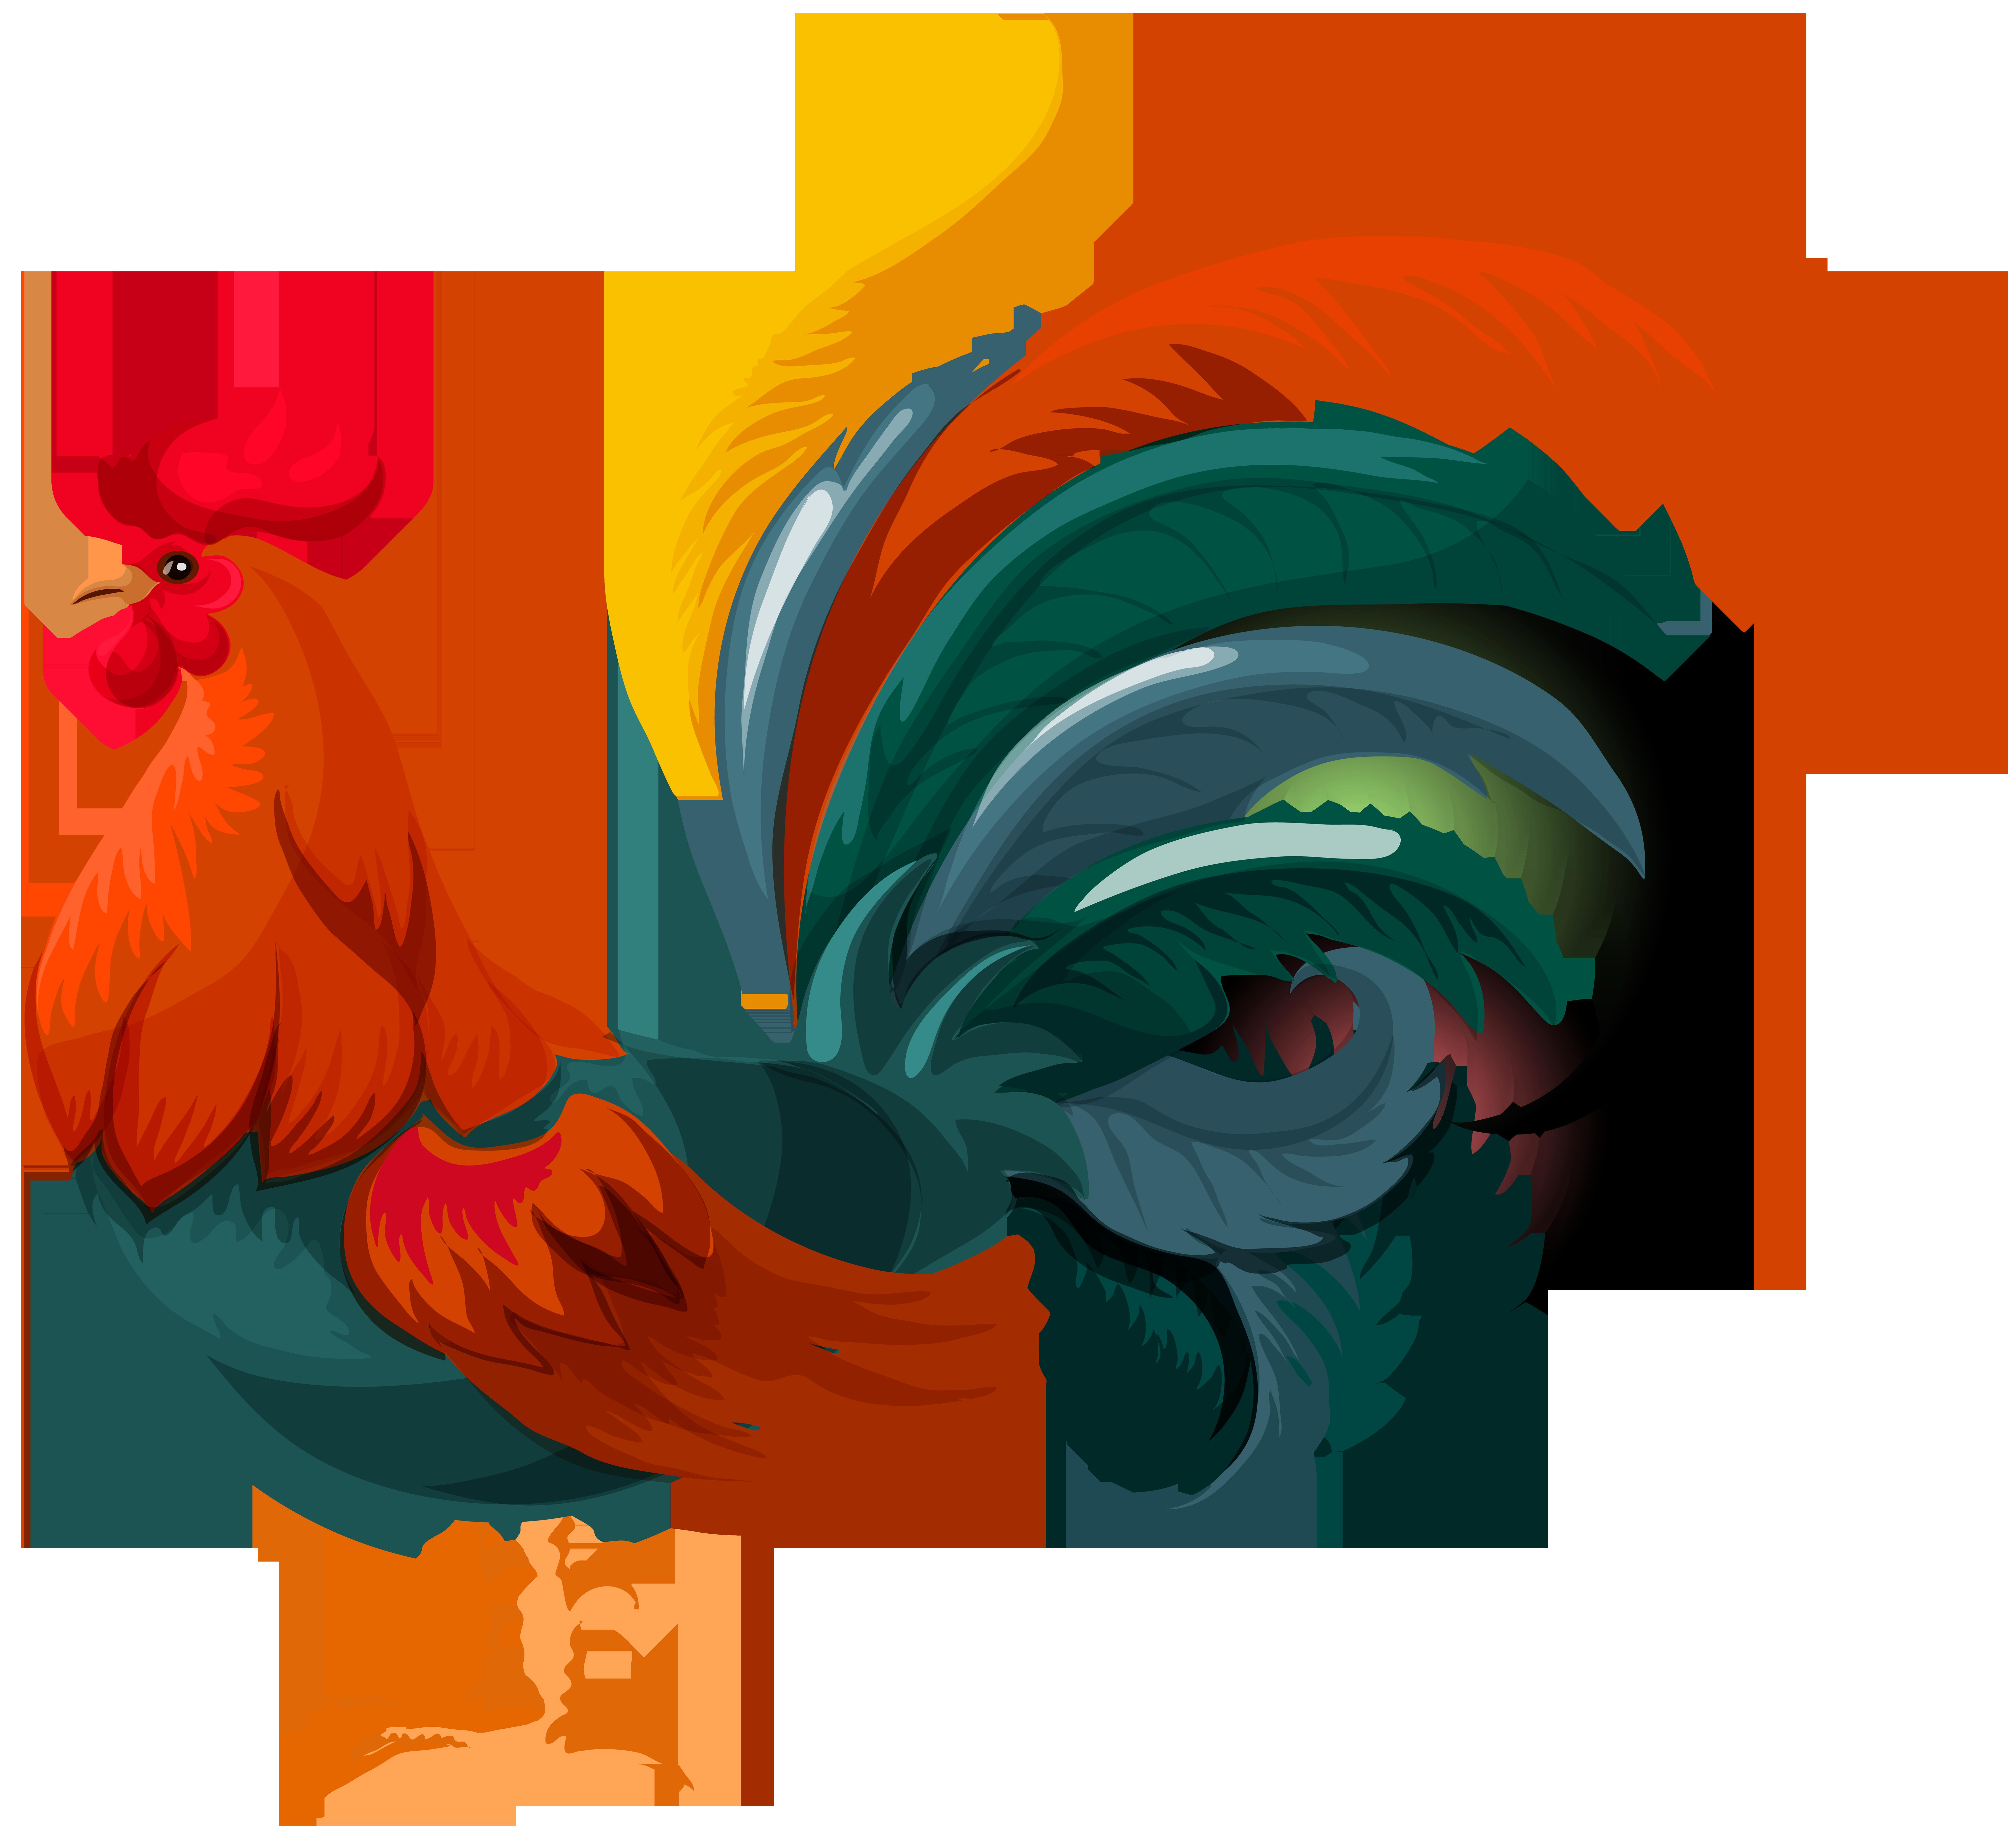 Proud clipart esp. Rooster clip art schliferaward